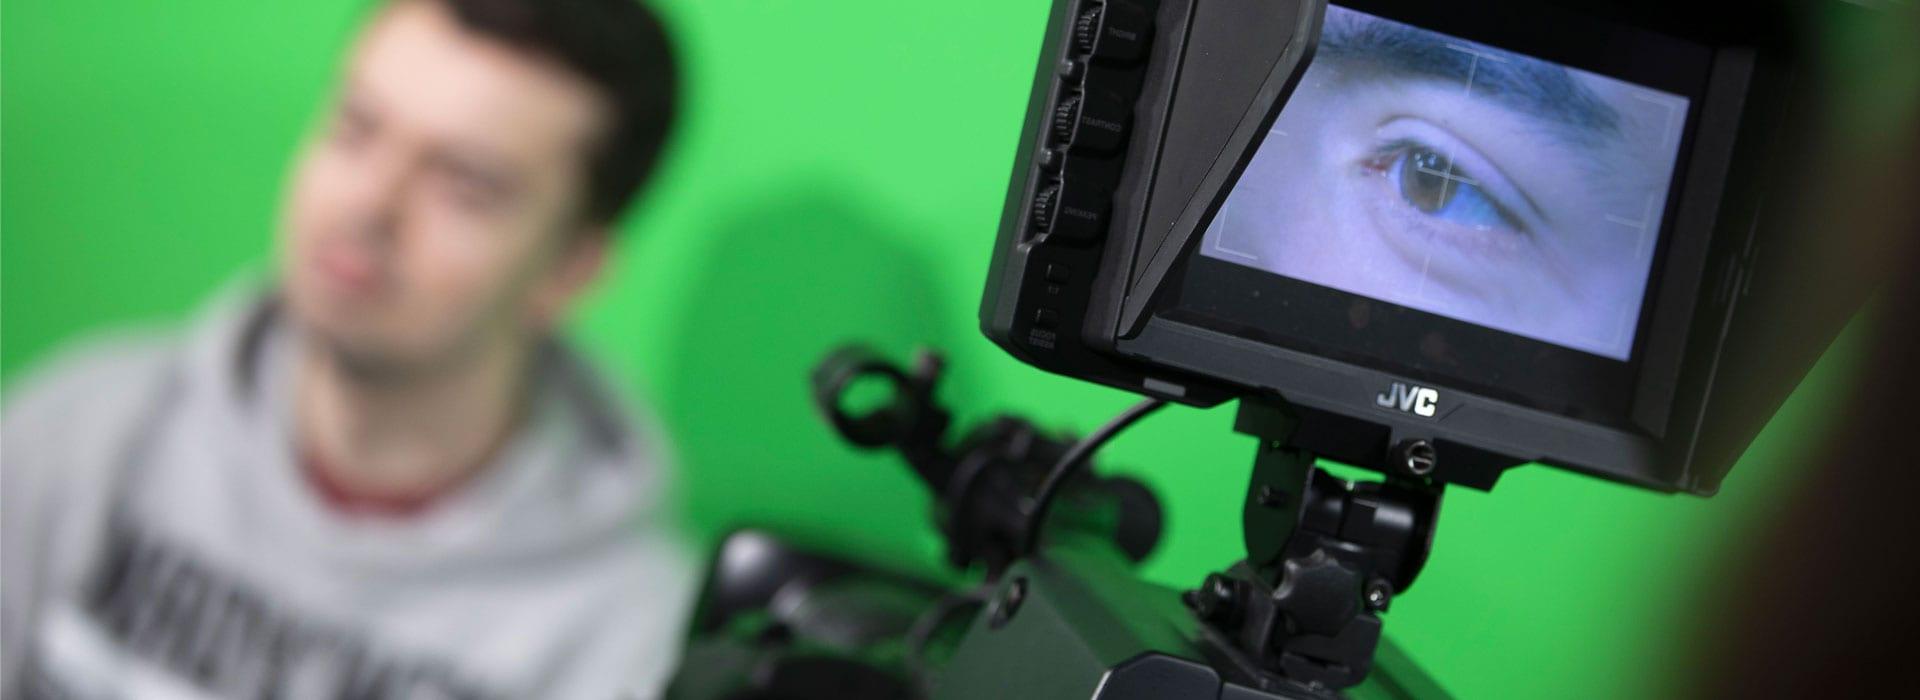 Media, Communication & TV